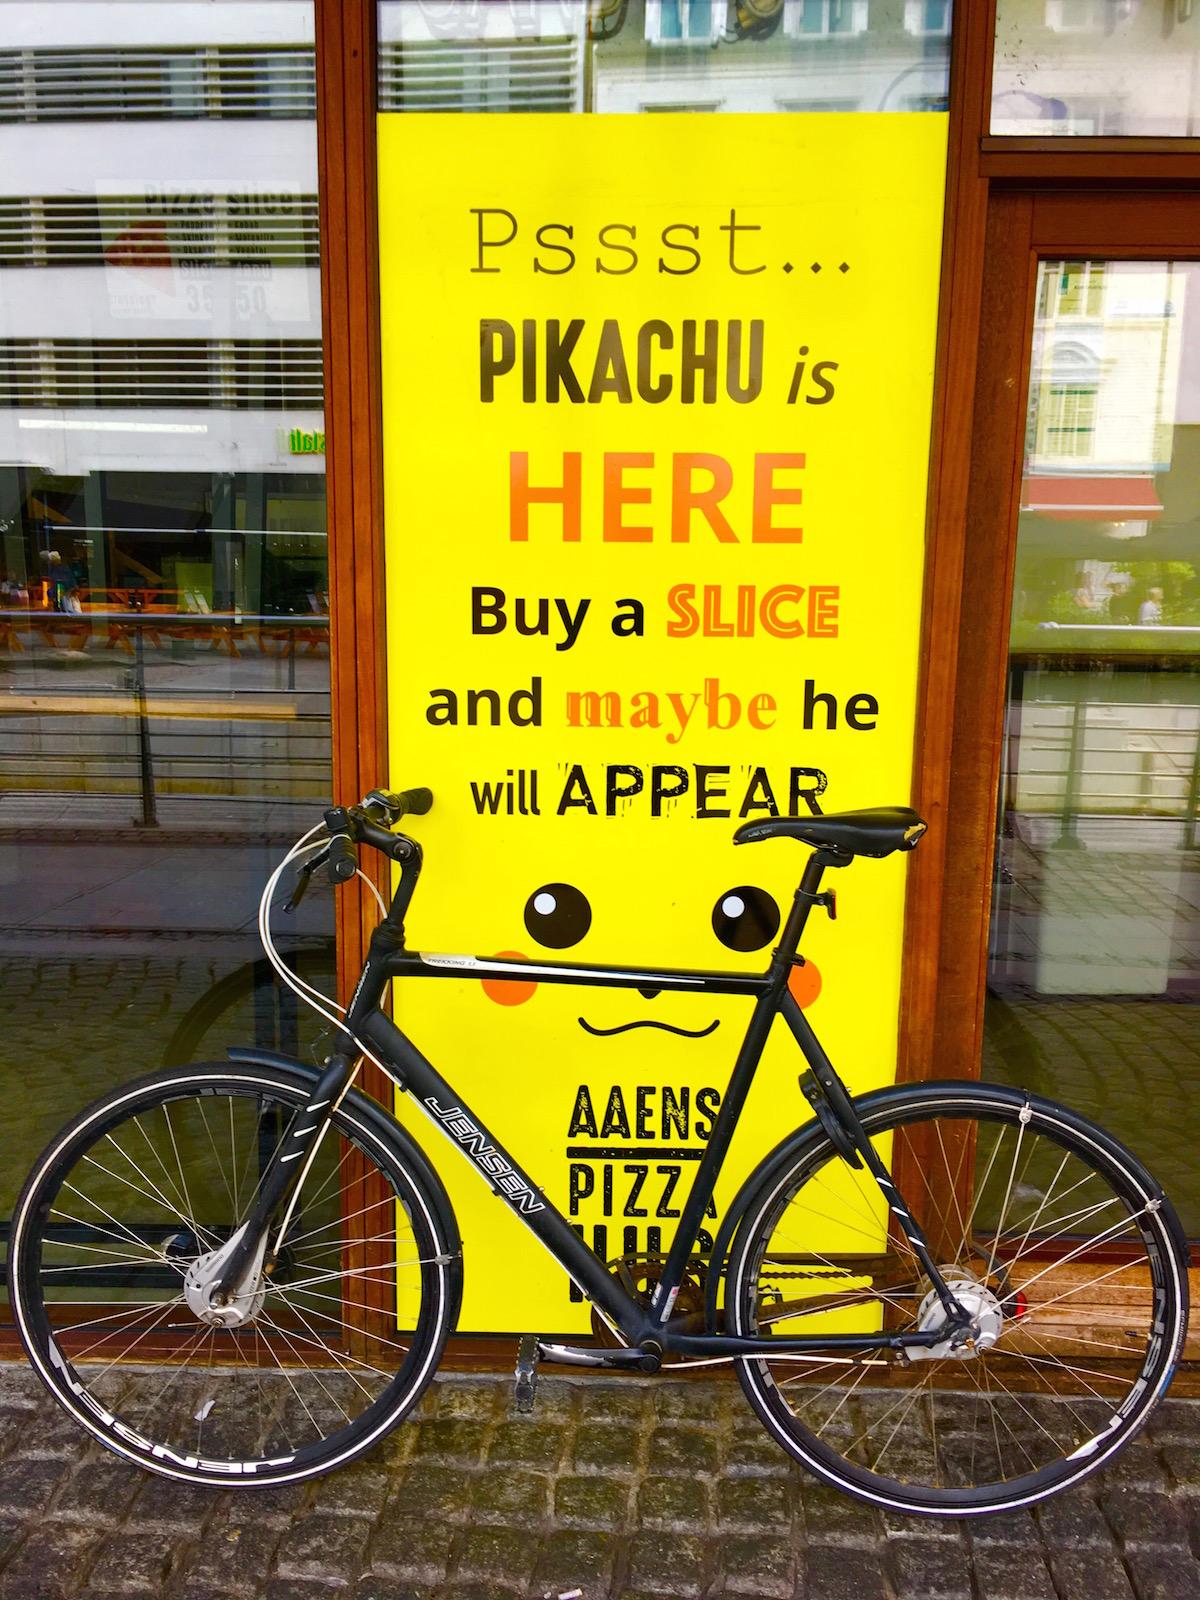 restaurant pitching Pokemon in Aarhus, Denmark